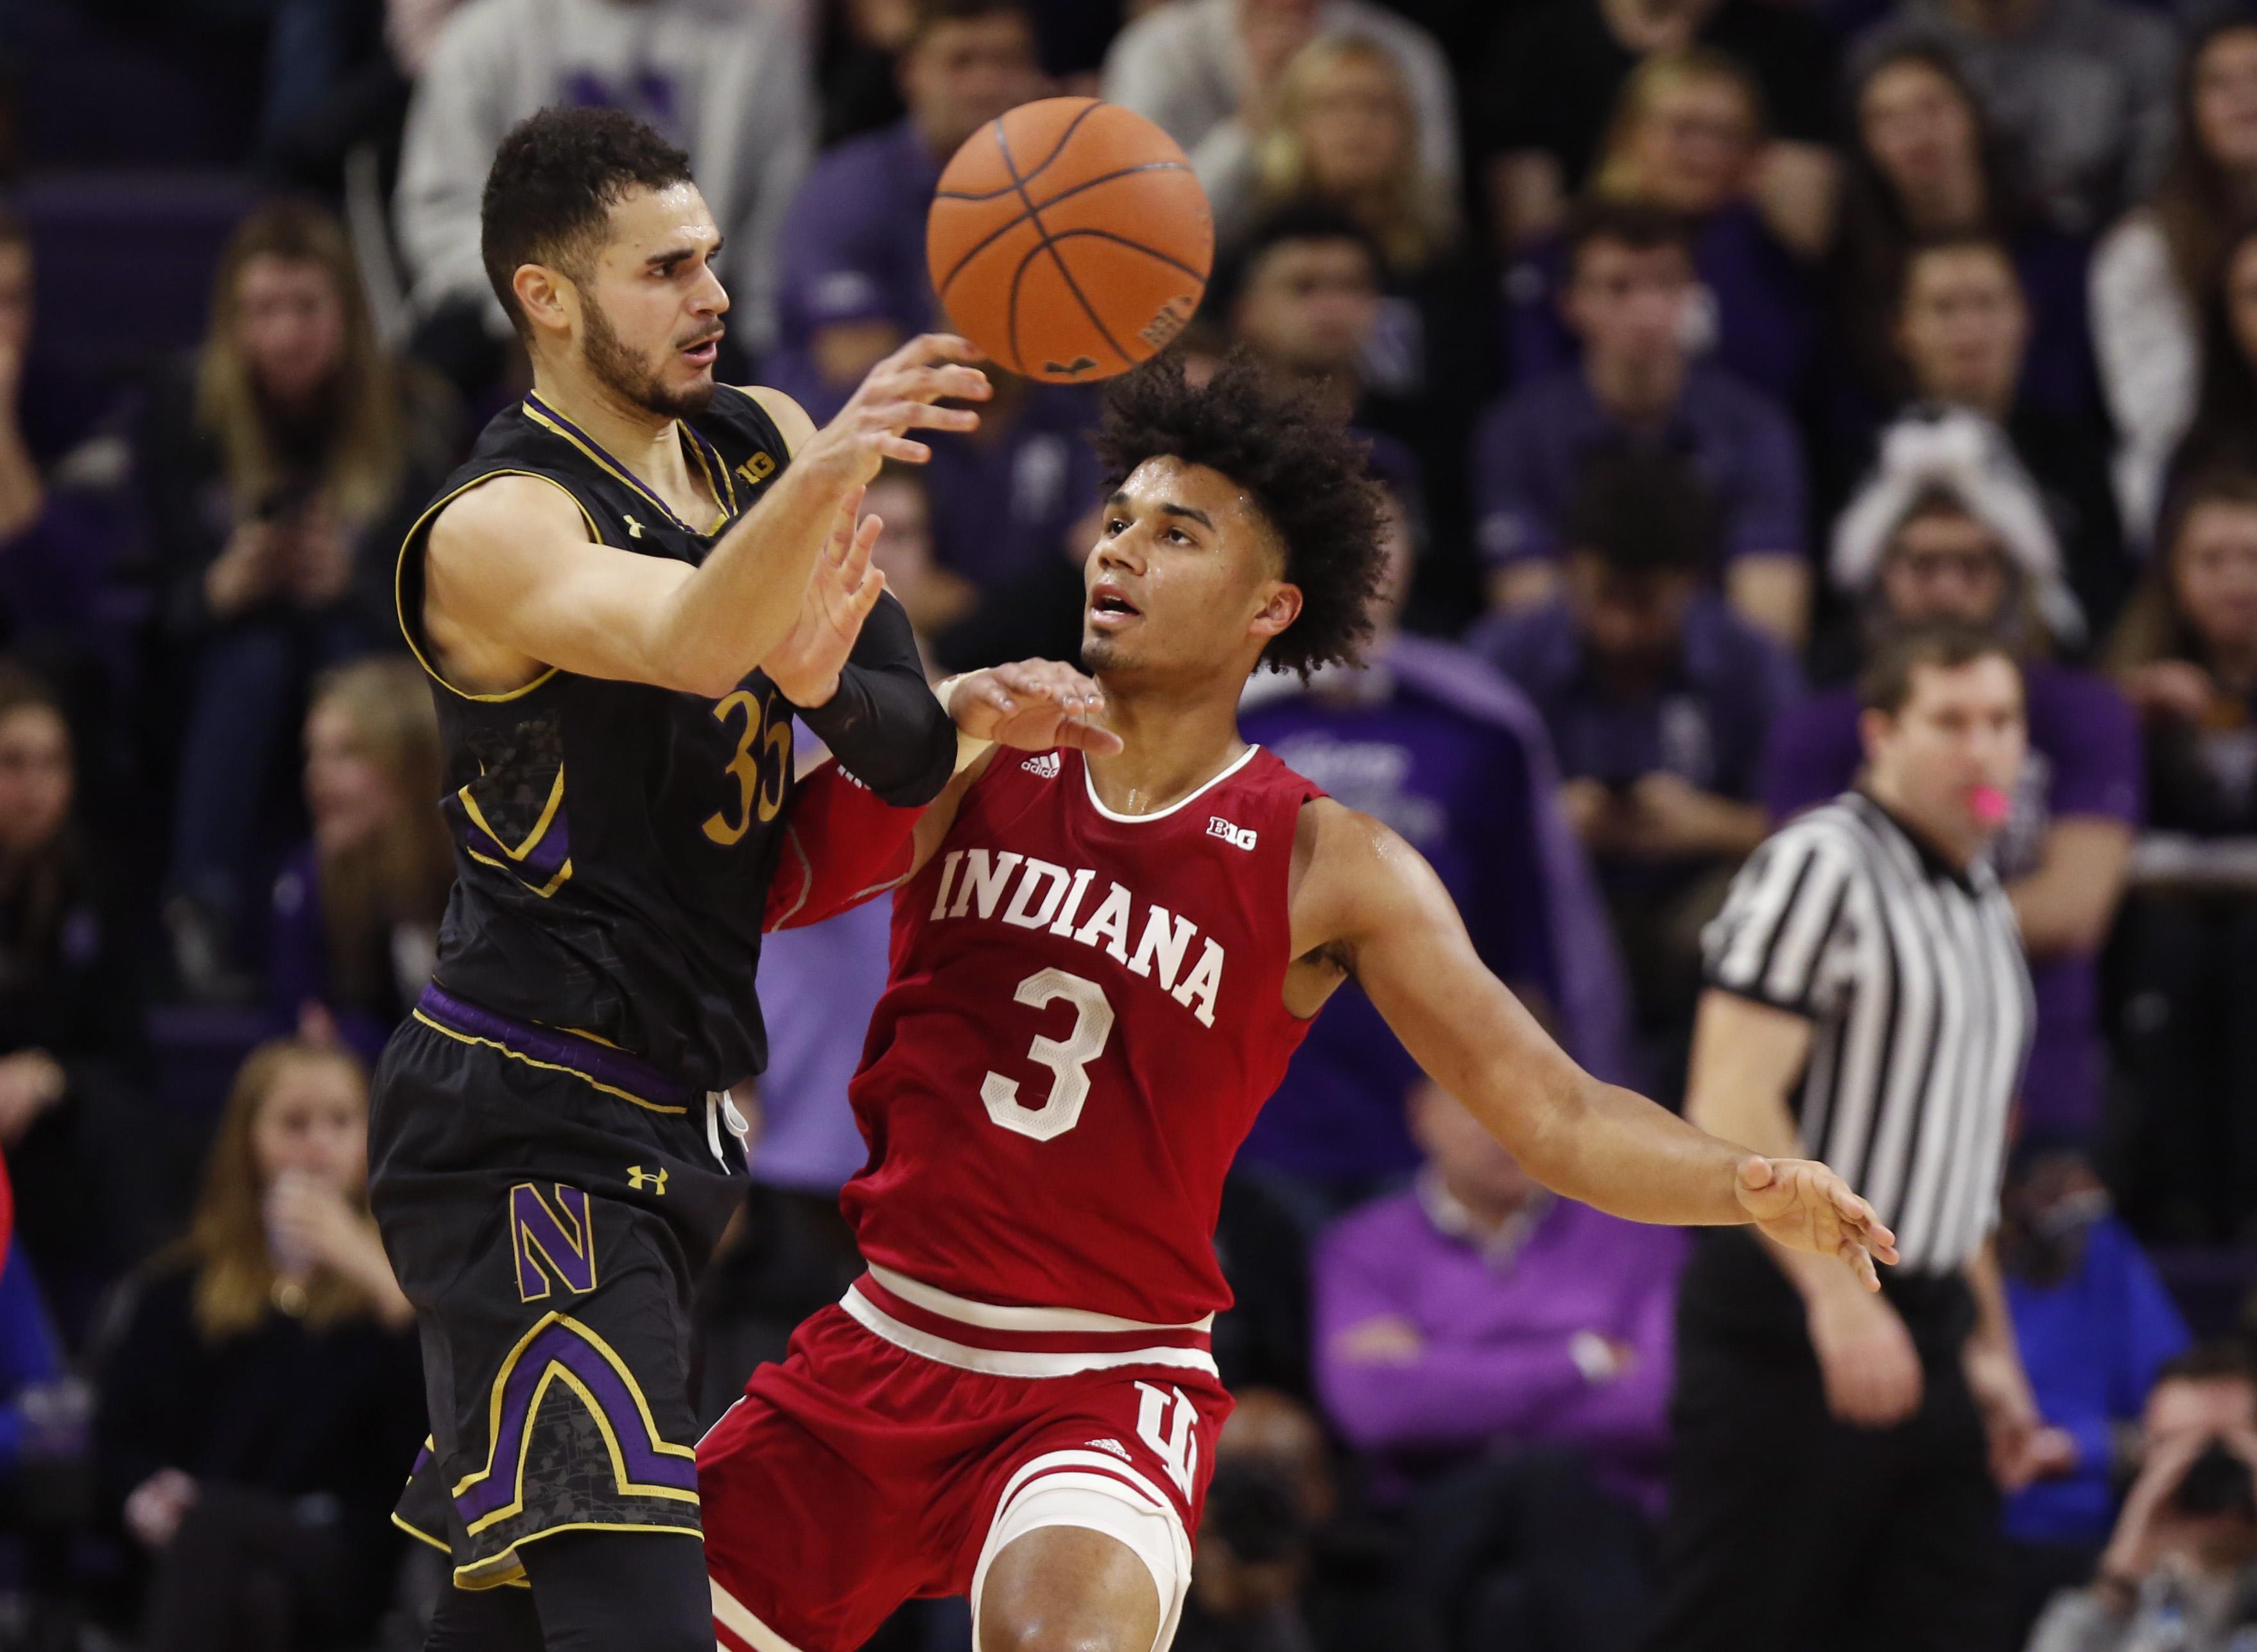 NCAA Basketball: Indiana at Northwestern